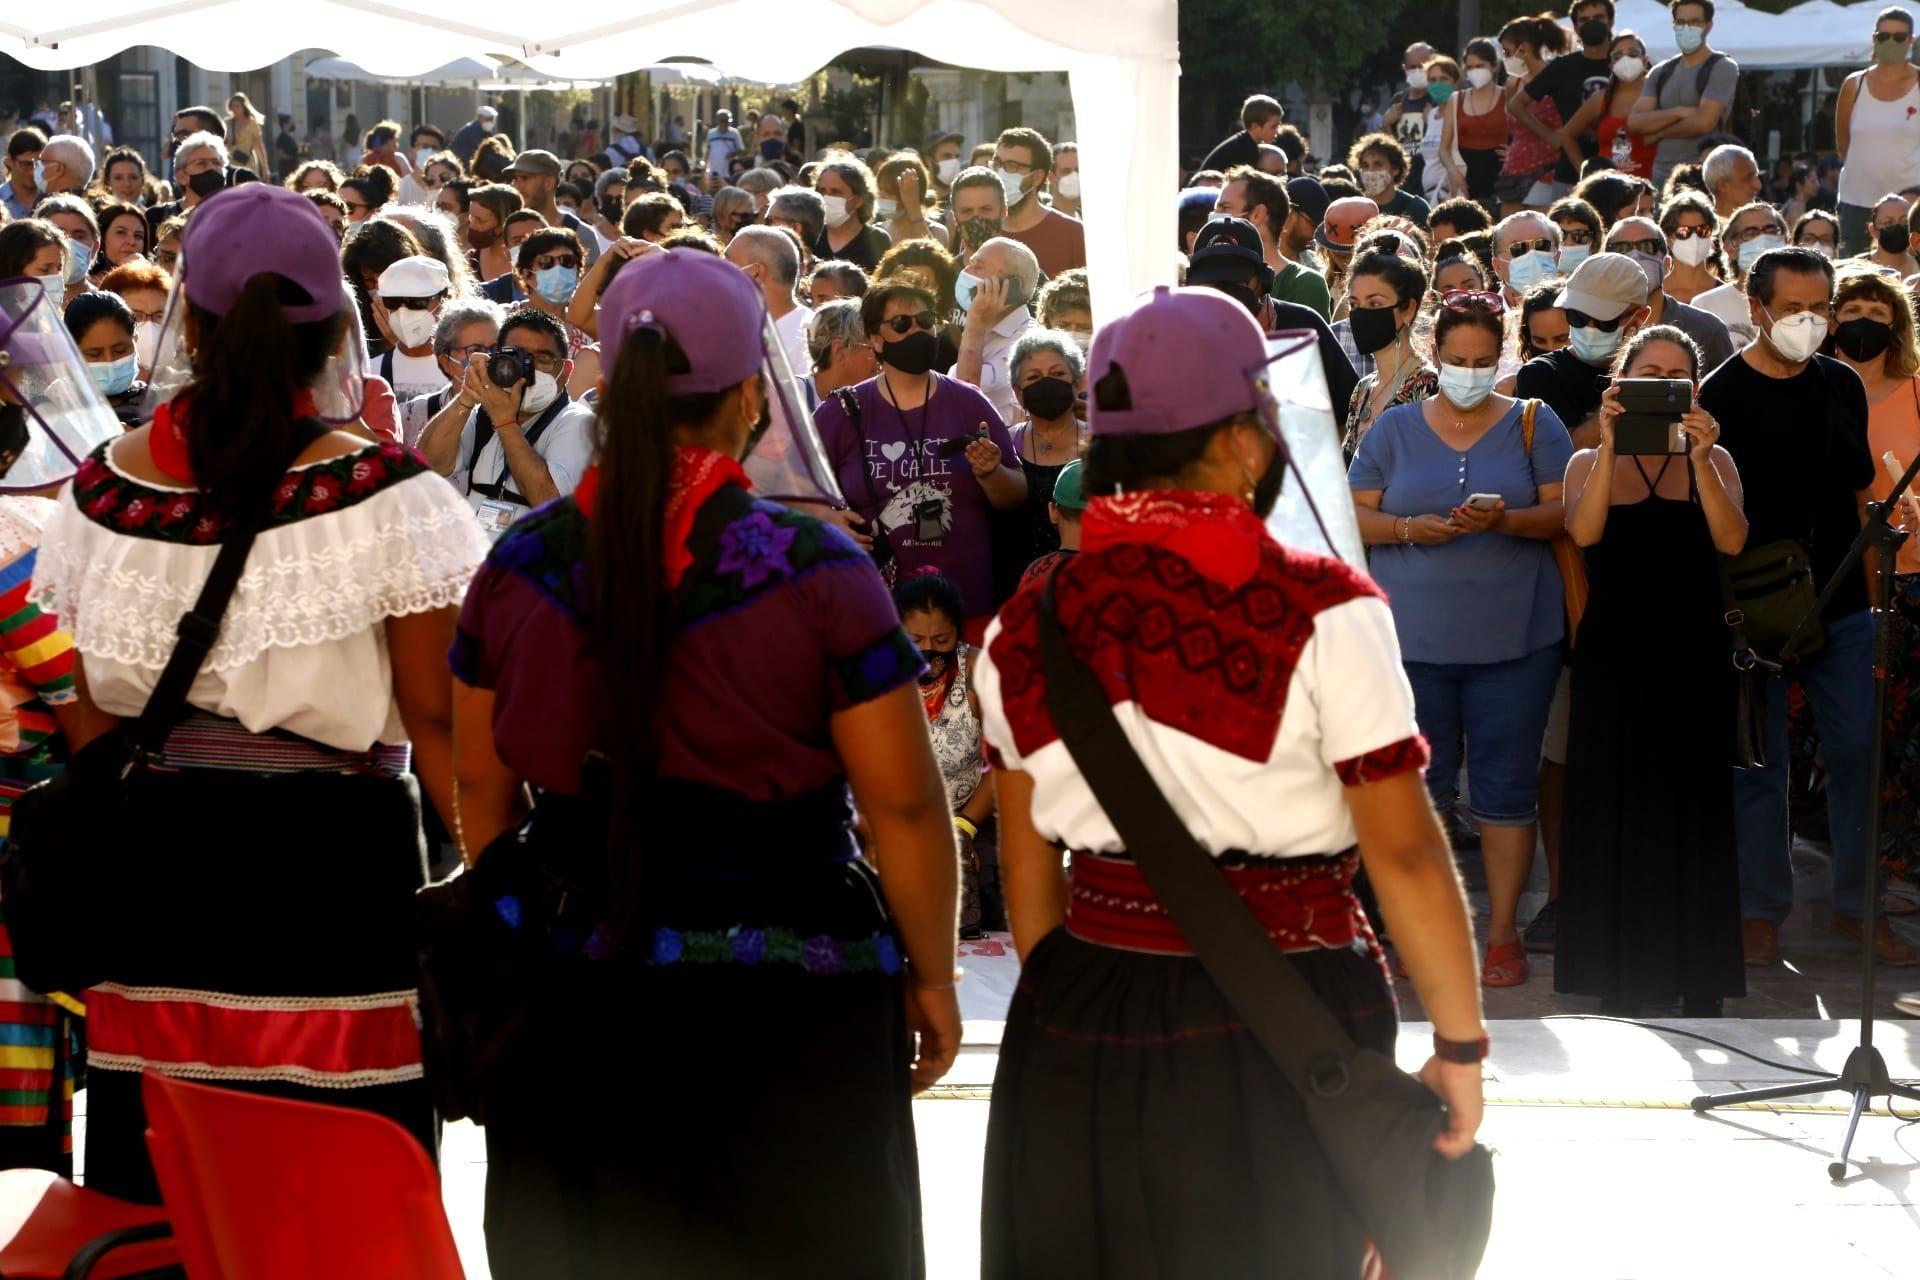 Un grupo de zapatistas mexicanos llega a València para vertebrar luchas compartidas